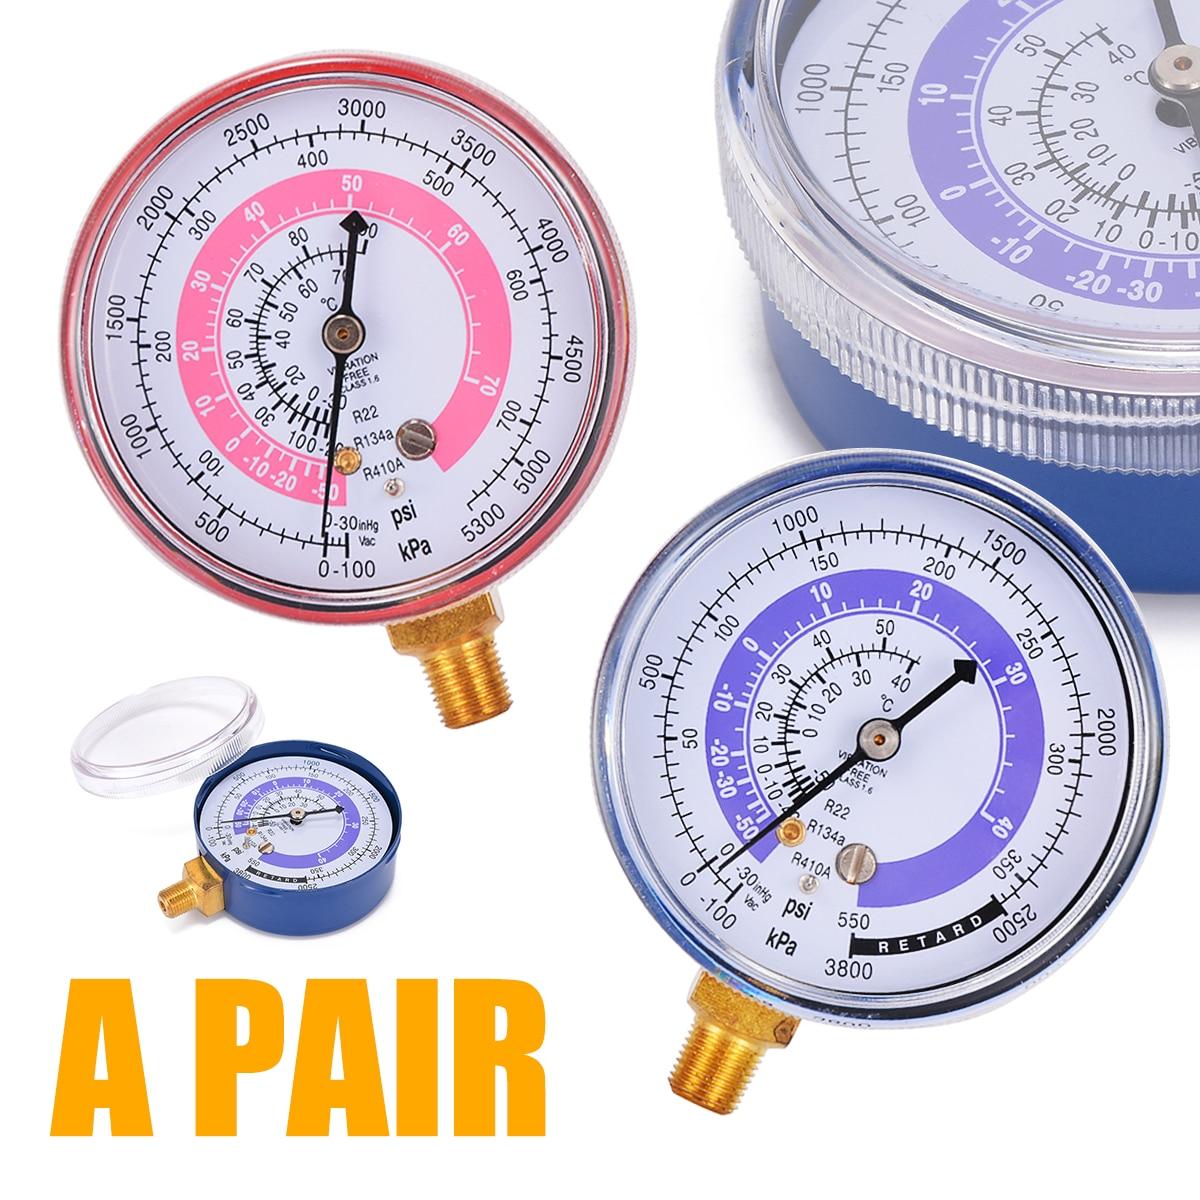 1 Pair Air Conditioner Pressure Gauge R134A R22 R410A Air Conditioner Refrigerant High Low Pressure Gauge Measuring Tool